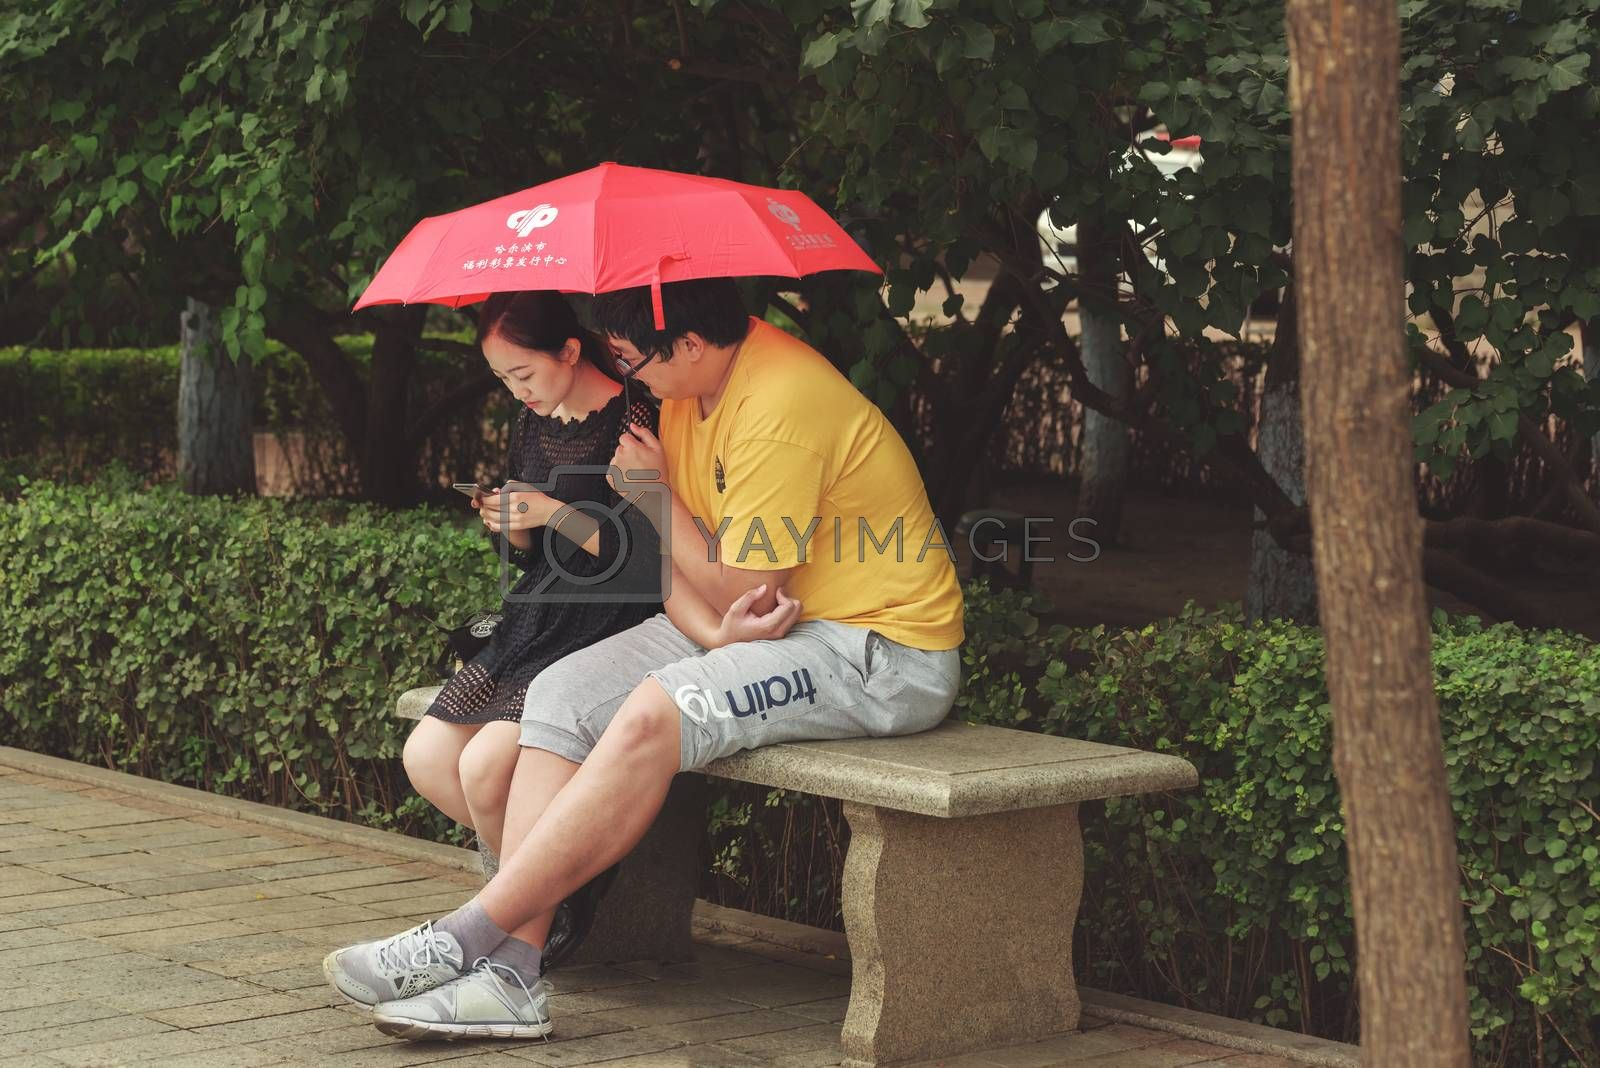 Harbin, Heilongjiang, China - September 2018: Couple sitting on bench. Man and woman under umbrella